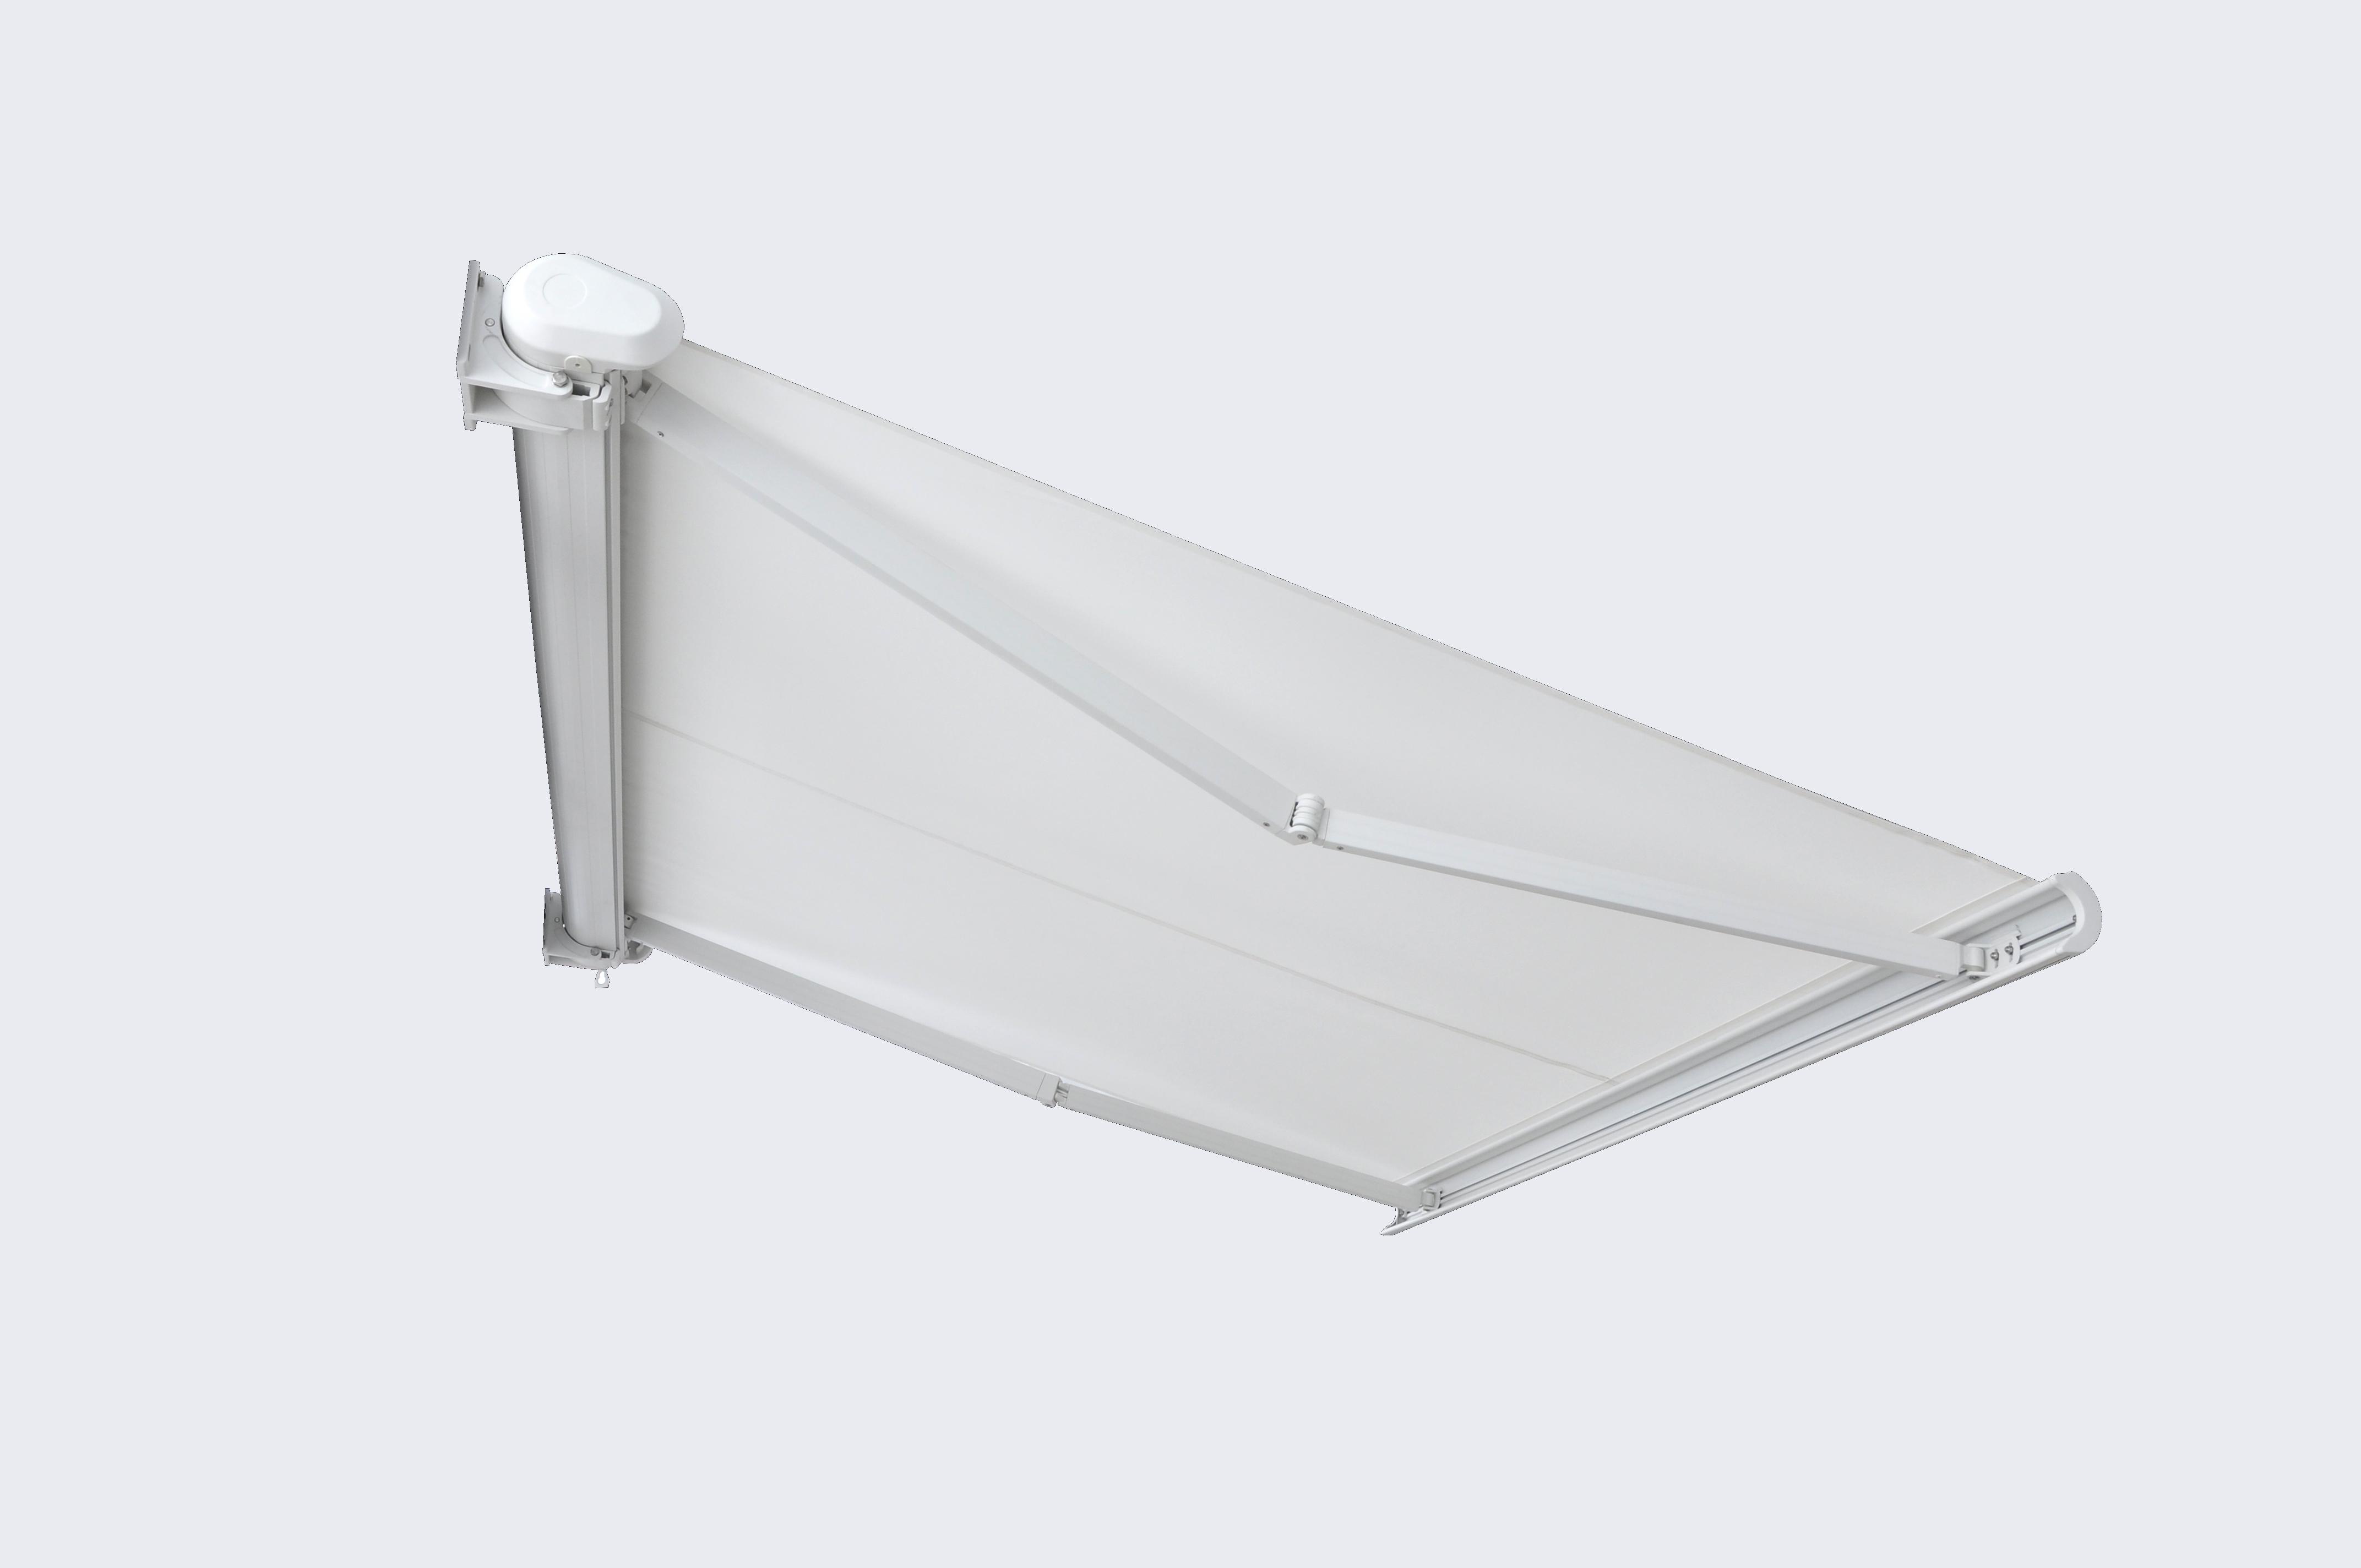 markise 5 5 3m elektronische vollkassettenmarkise terrasse sp1304 mit 2 farbe ebay. Black Bedroom Furniture Sets. Home Design Ideas